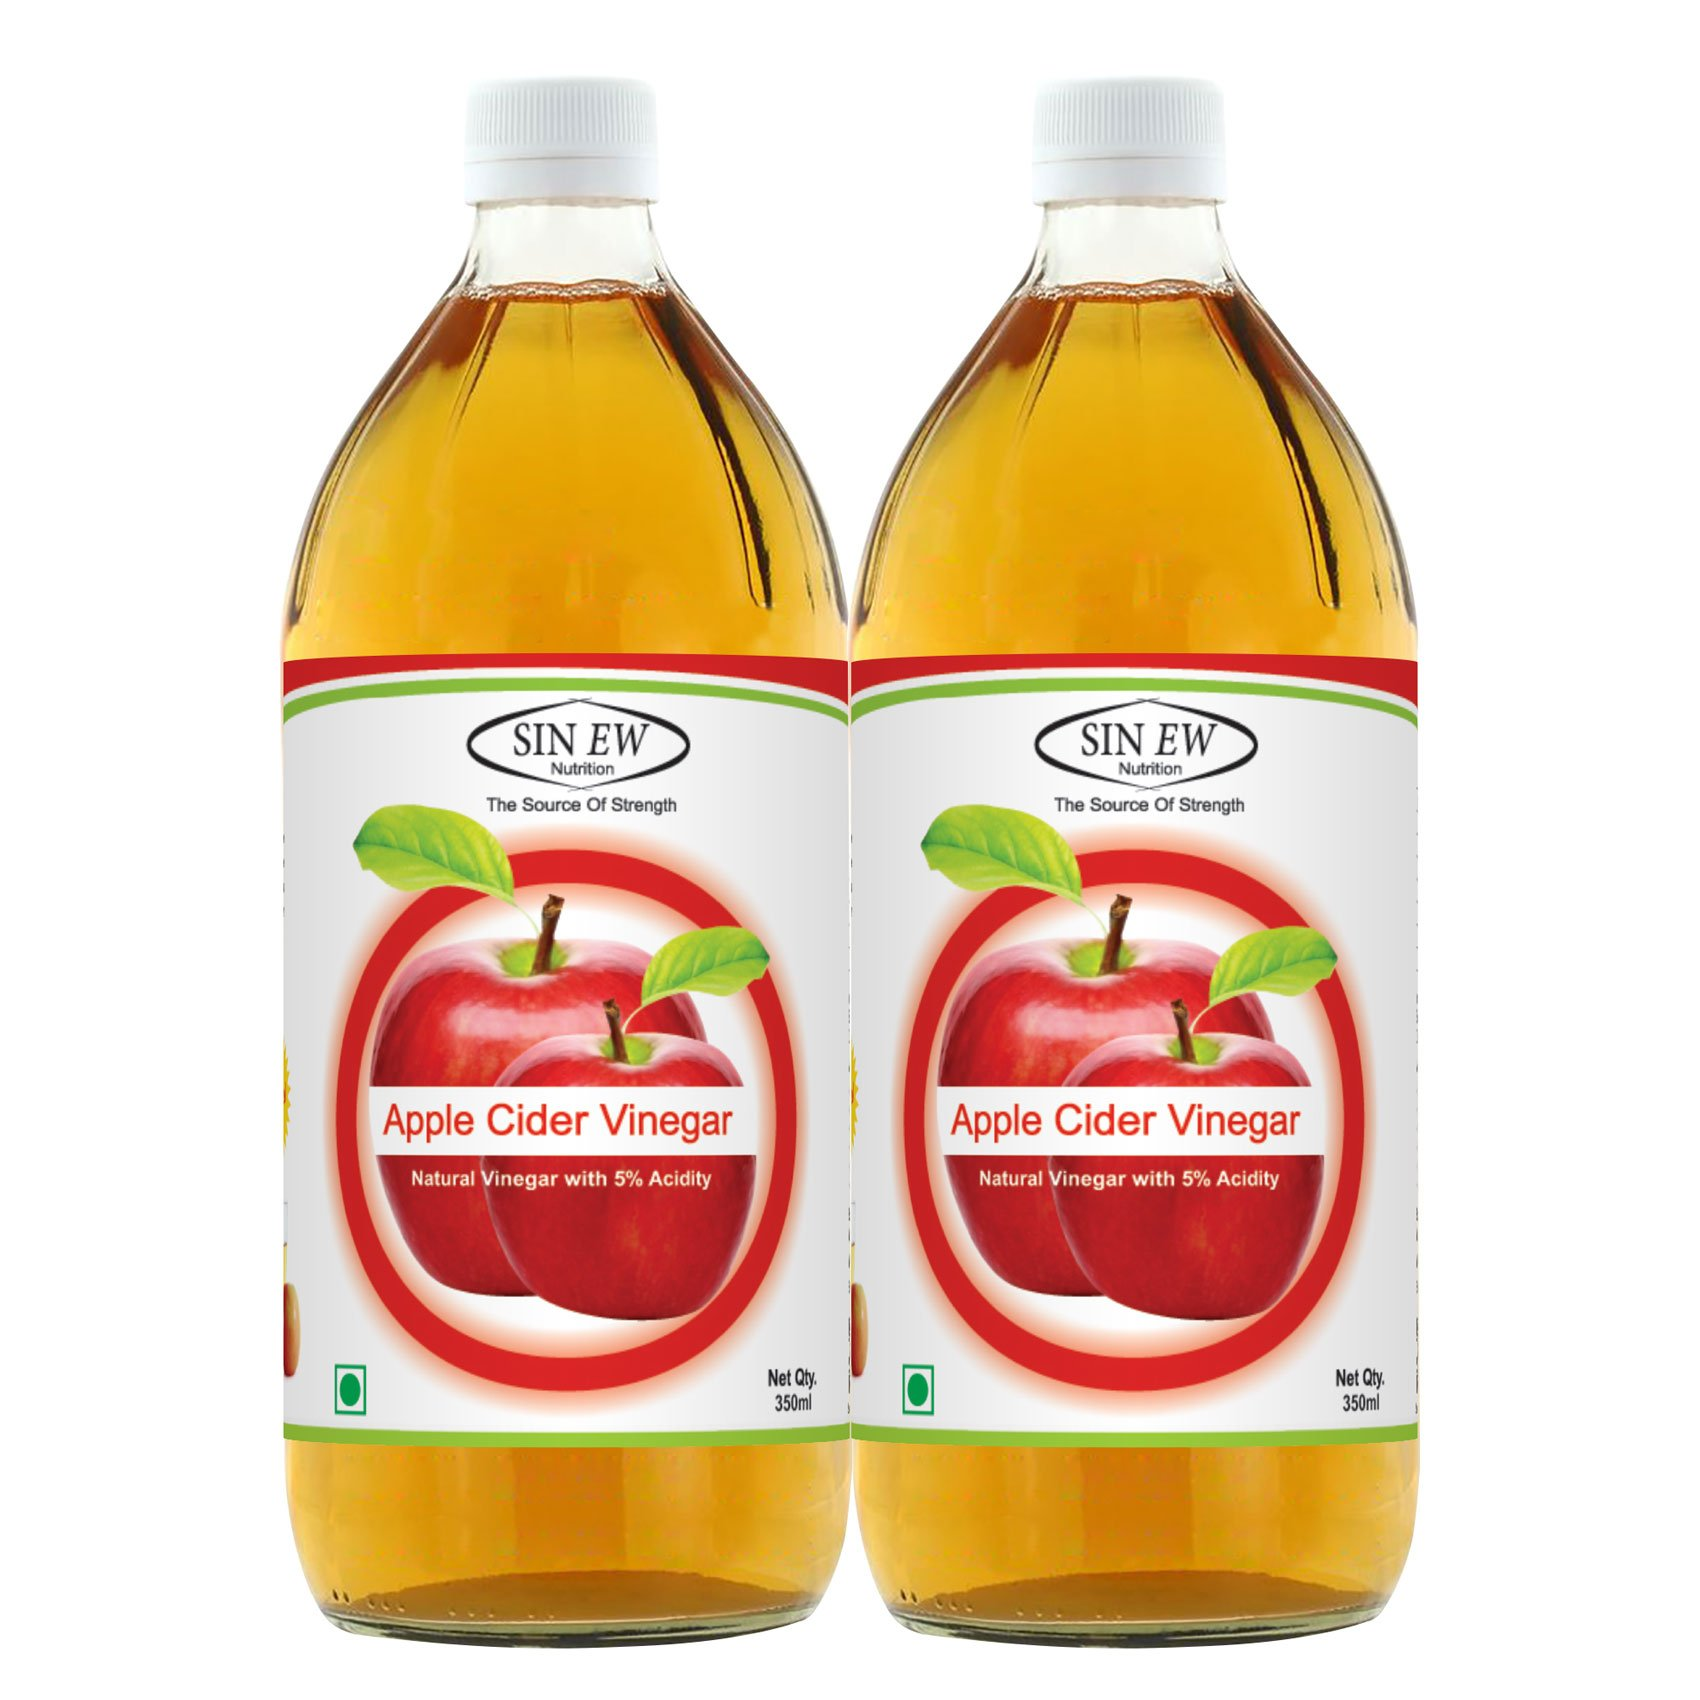 Sinew Nutrition Apple Cider Vinegar, 350ml (Pack of 2) product image